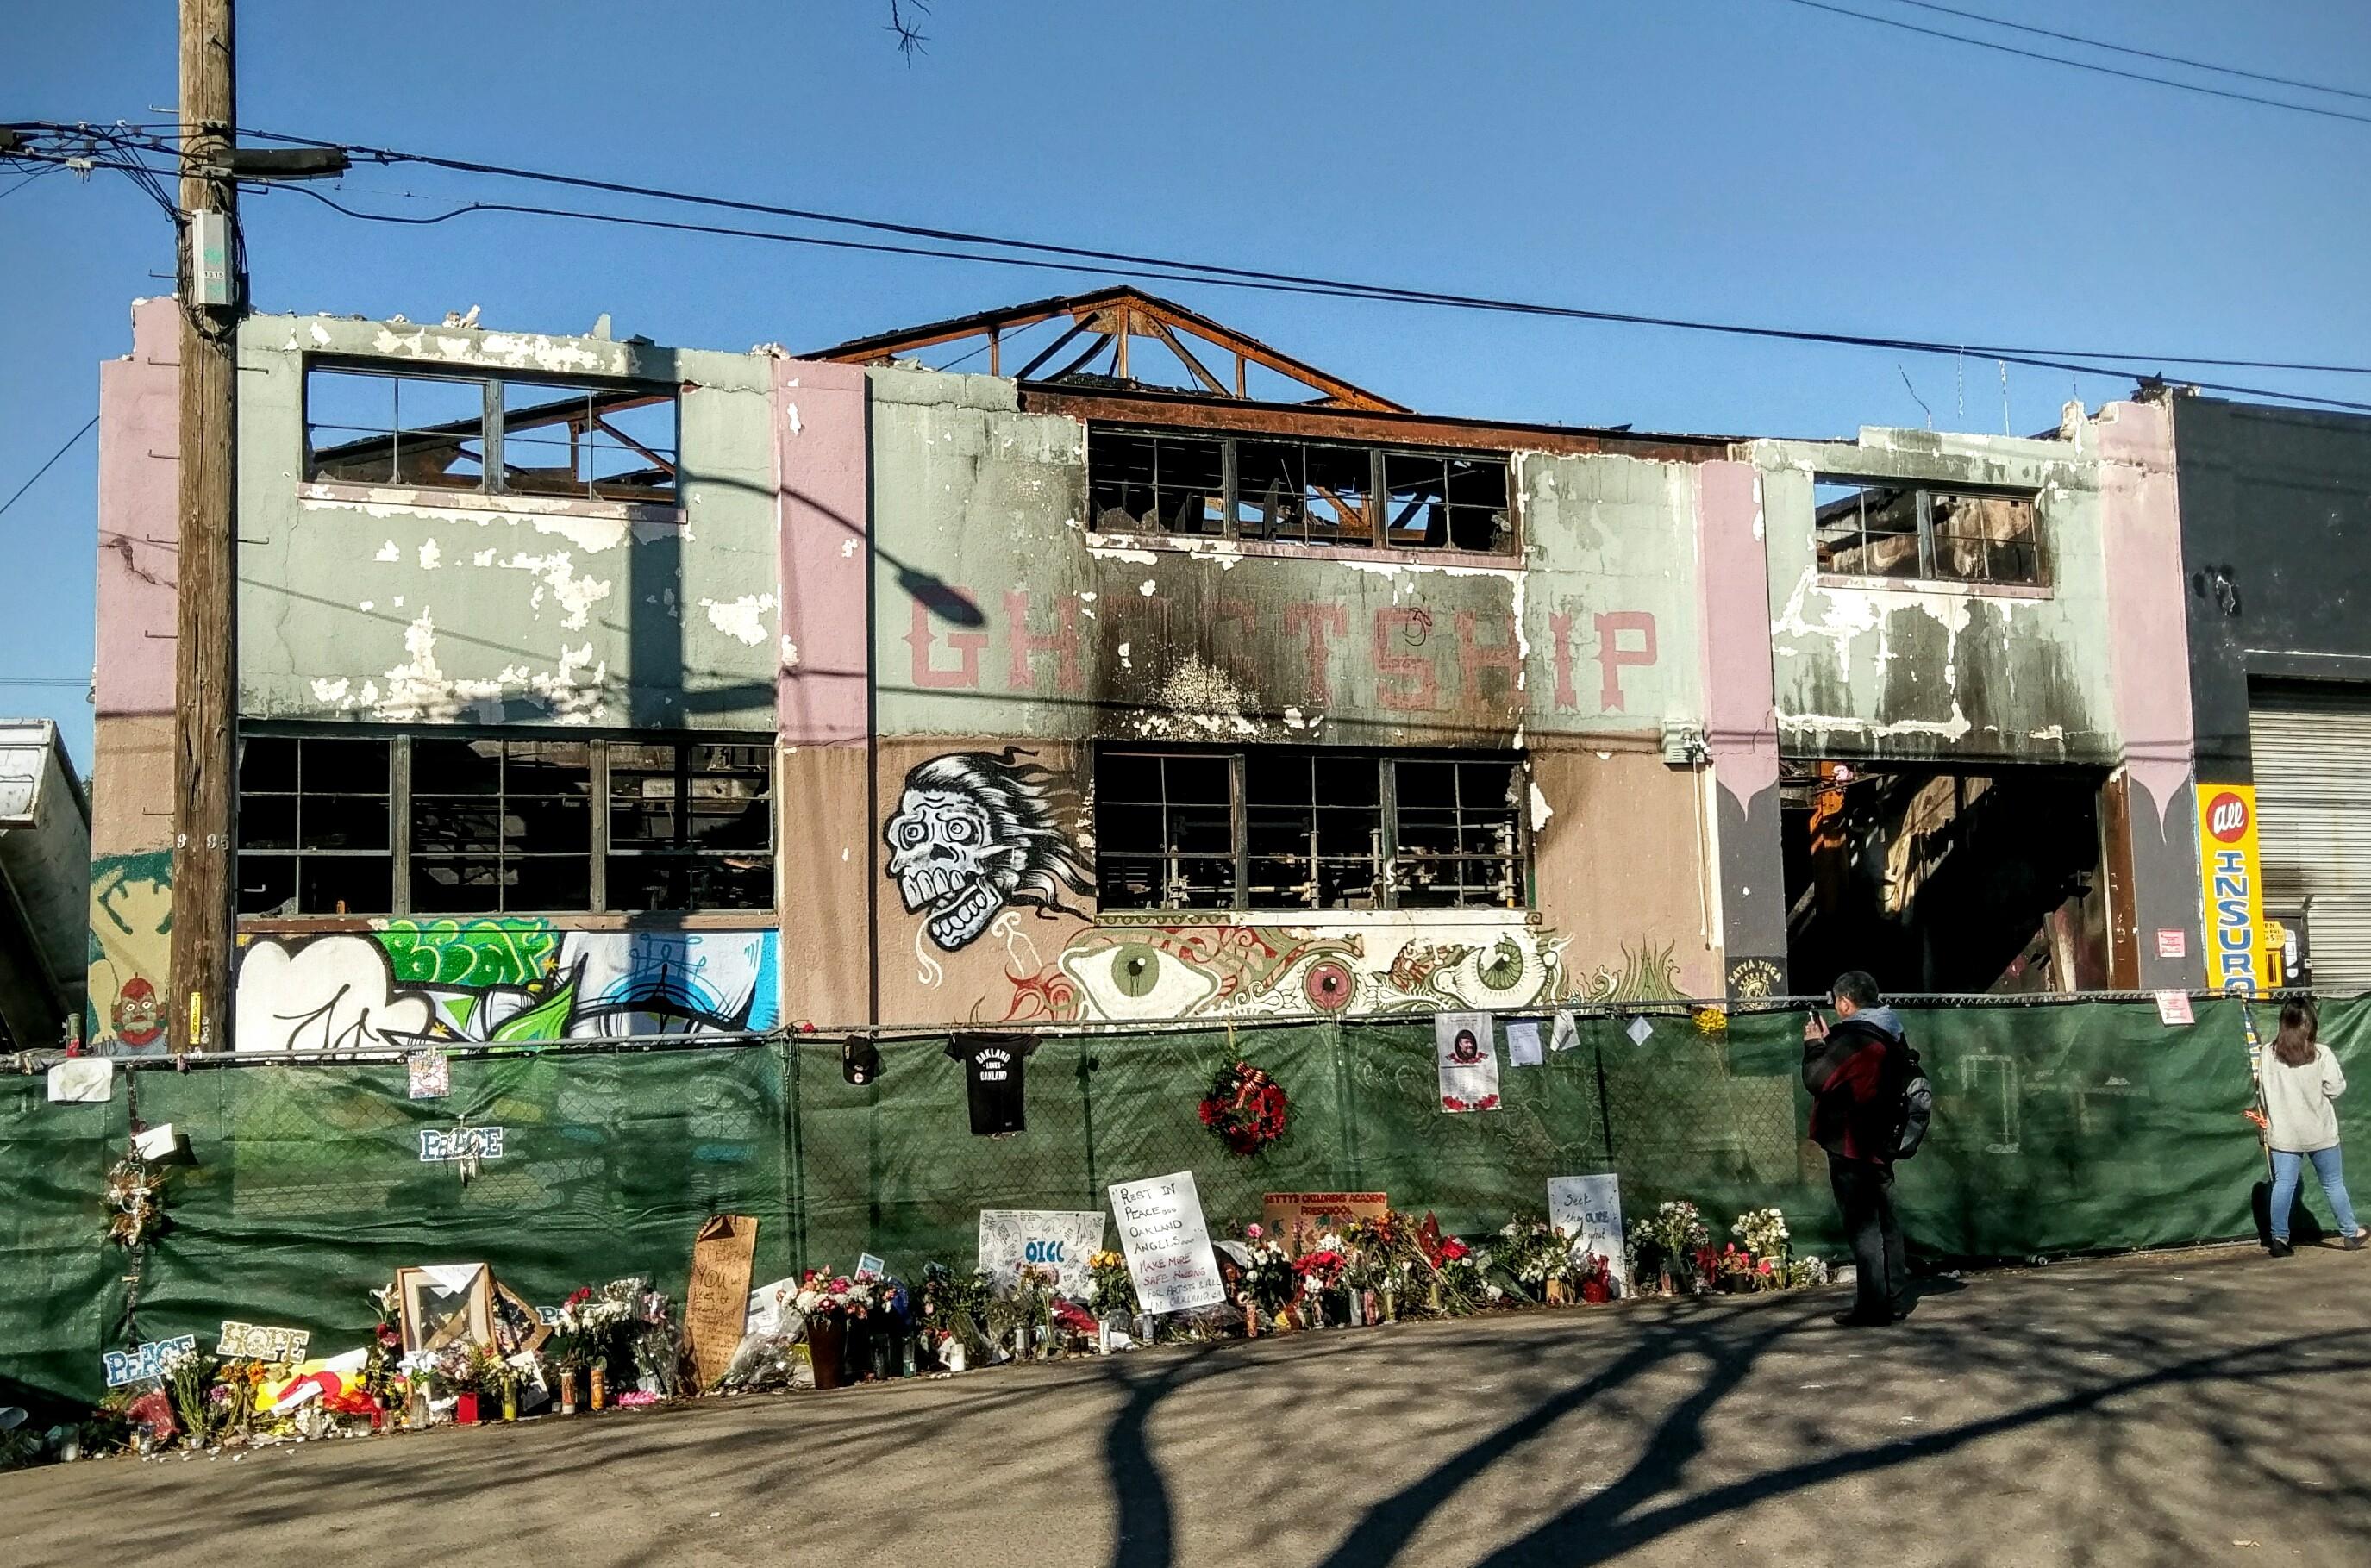 2016 oakland warehouse fire wikipedia building problems edit